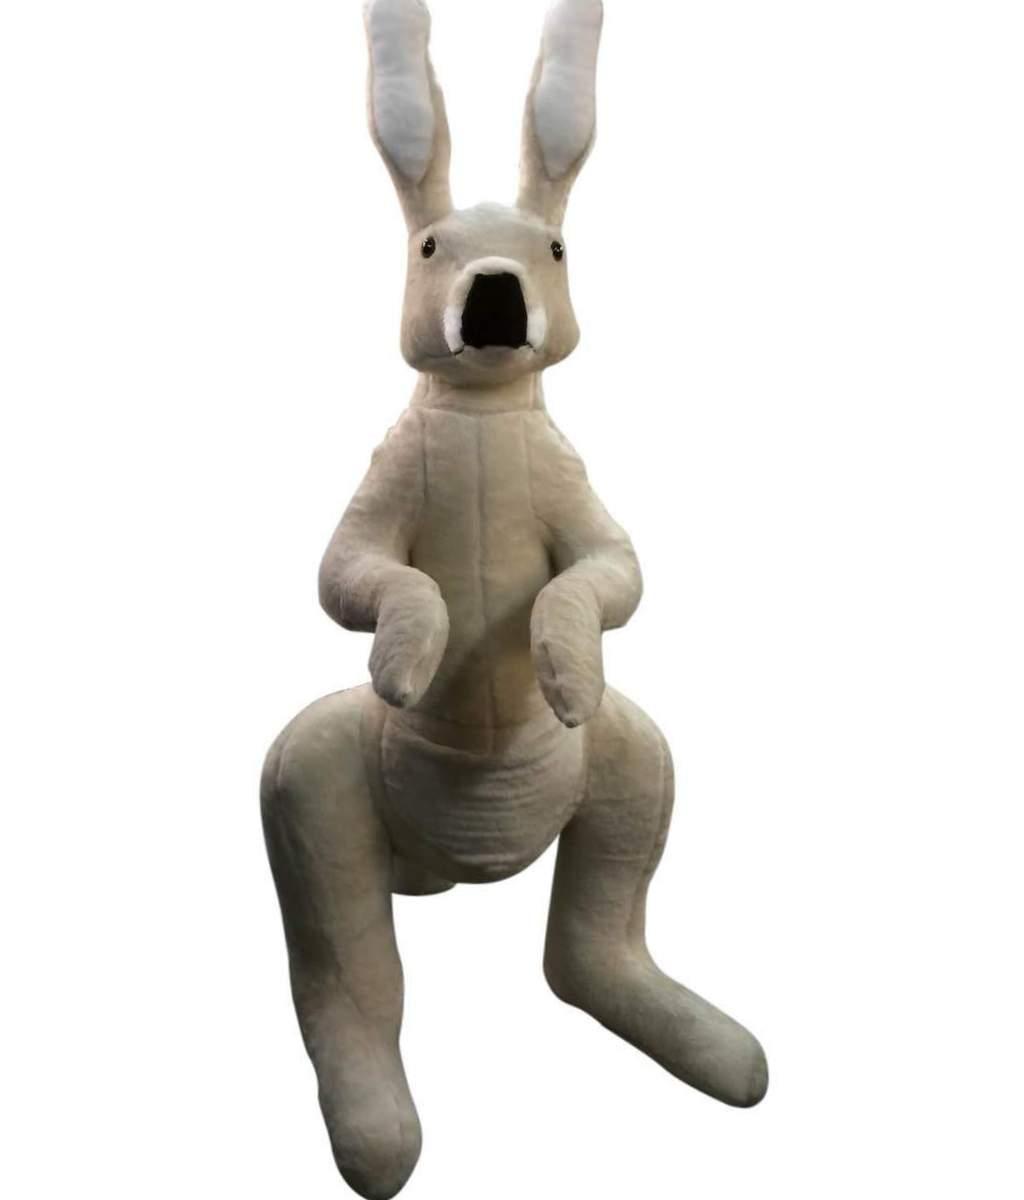 Big Plush 6 Foot Kangaroo Soft 72 Inch Stuffed Animal Made In Usa